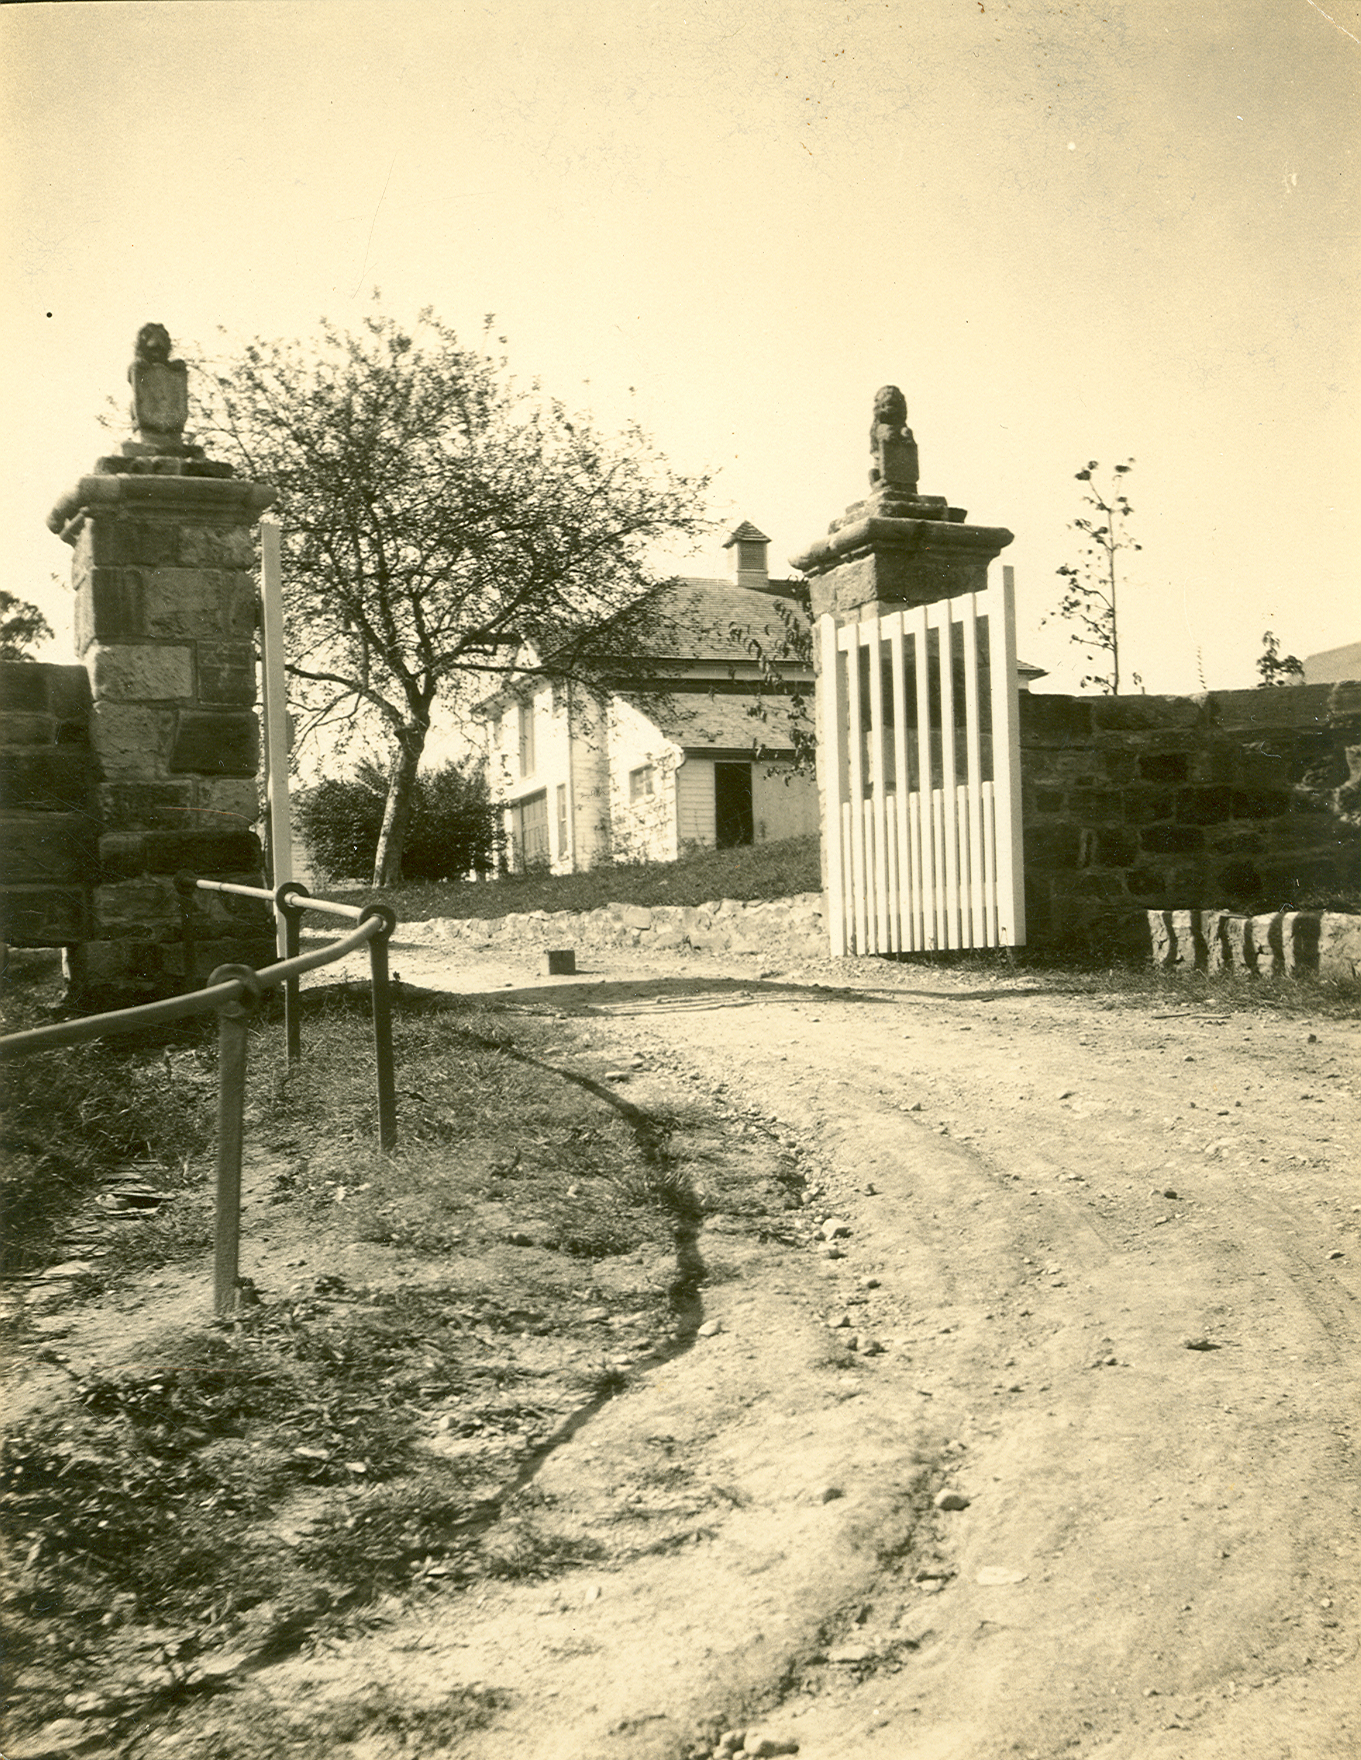 Gate circa 1920